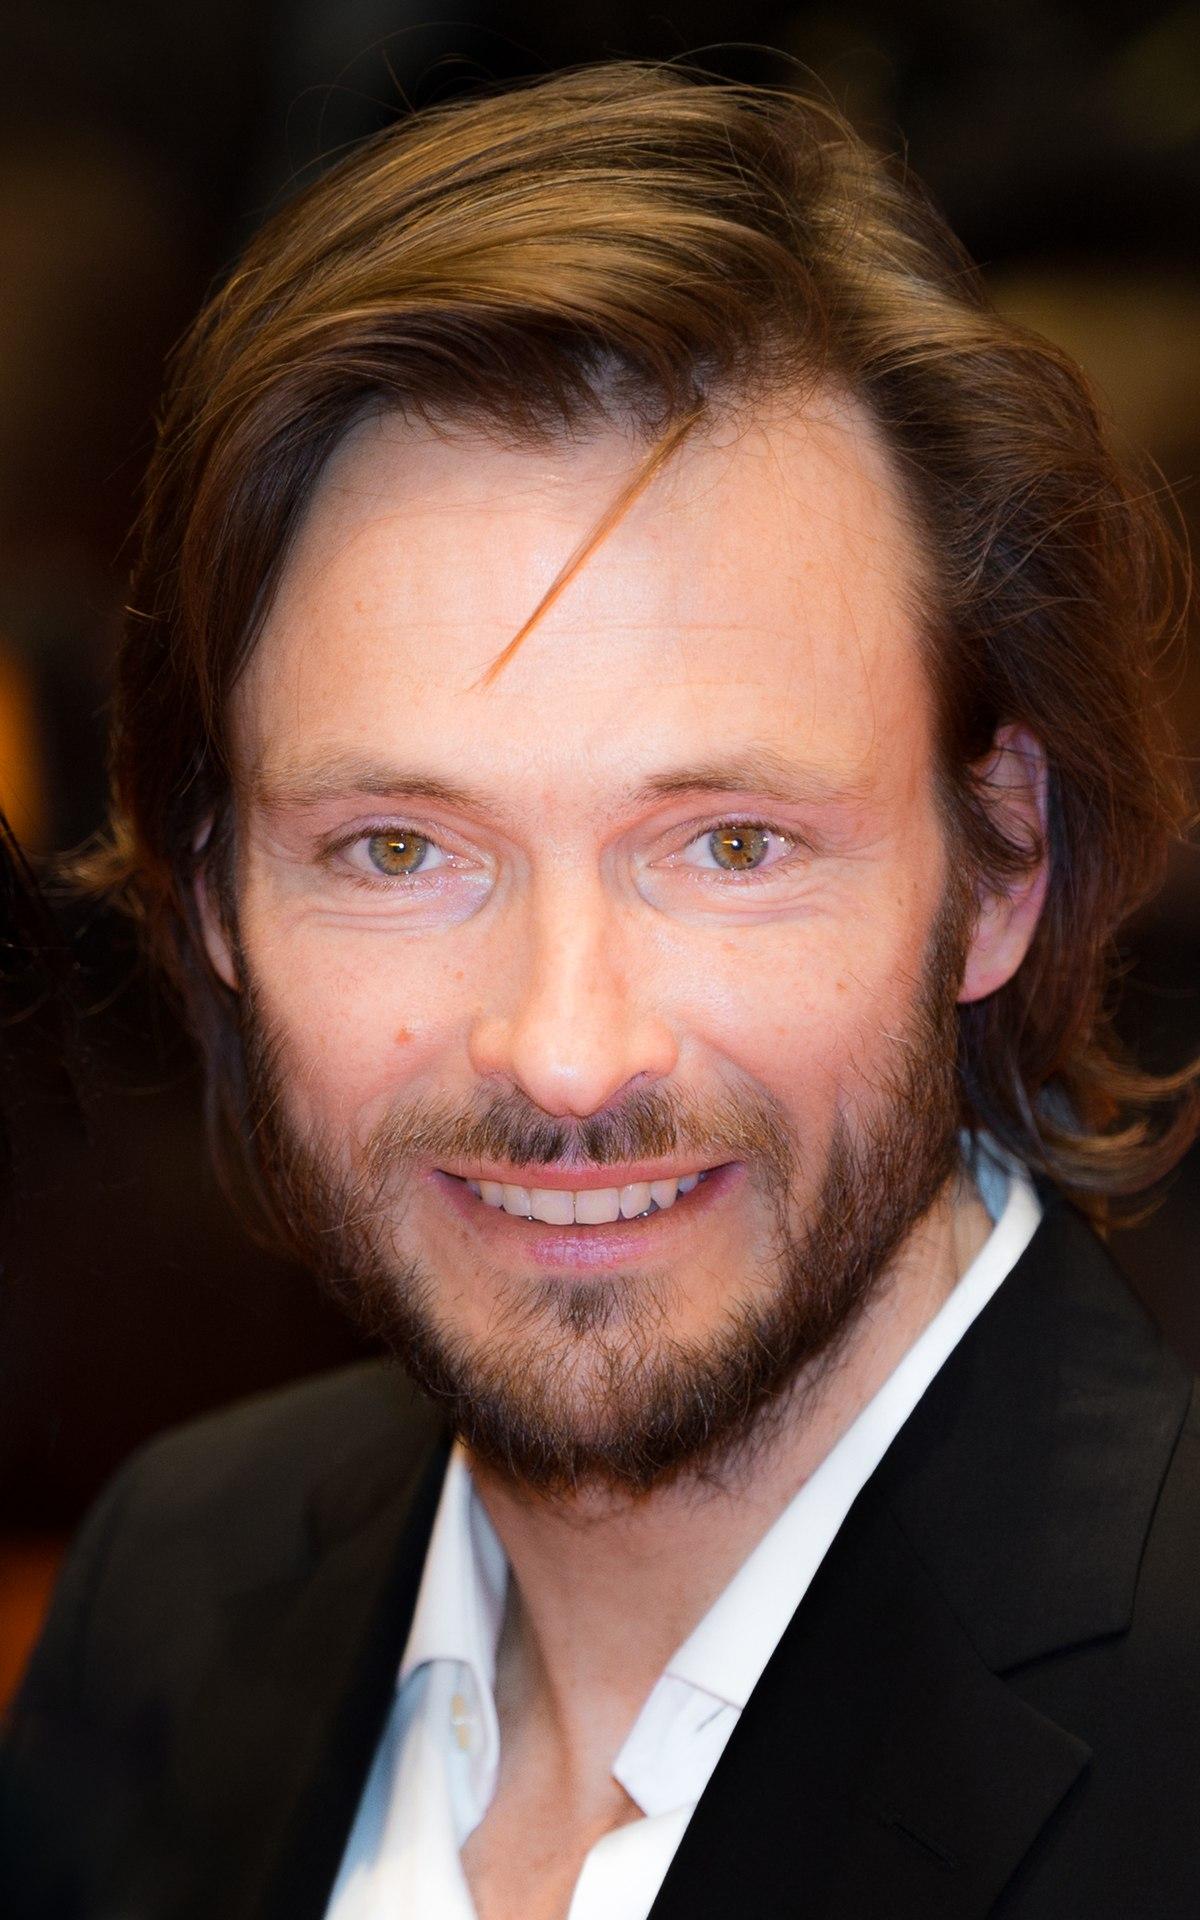 Max Grothusen - IMDb